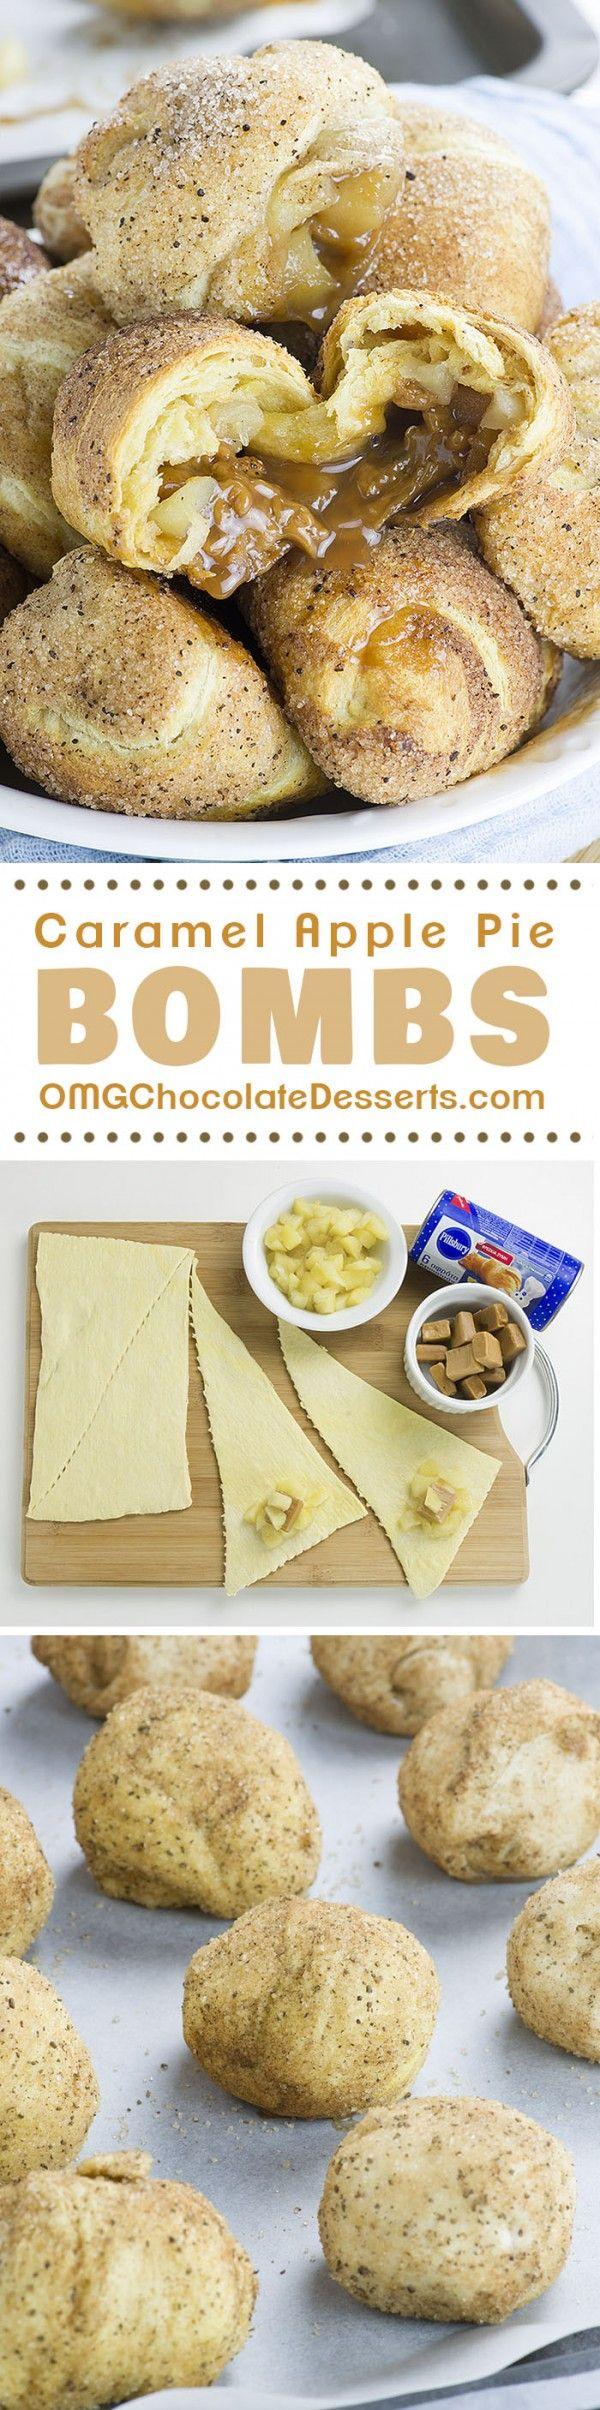 Get the recipe ♥ Caramel Apple Pie Bombs #besttoeat @recipes_to_go